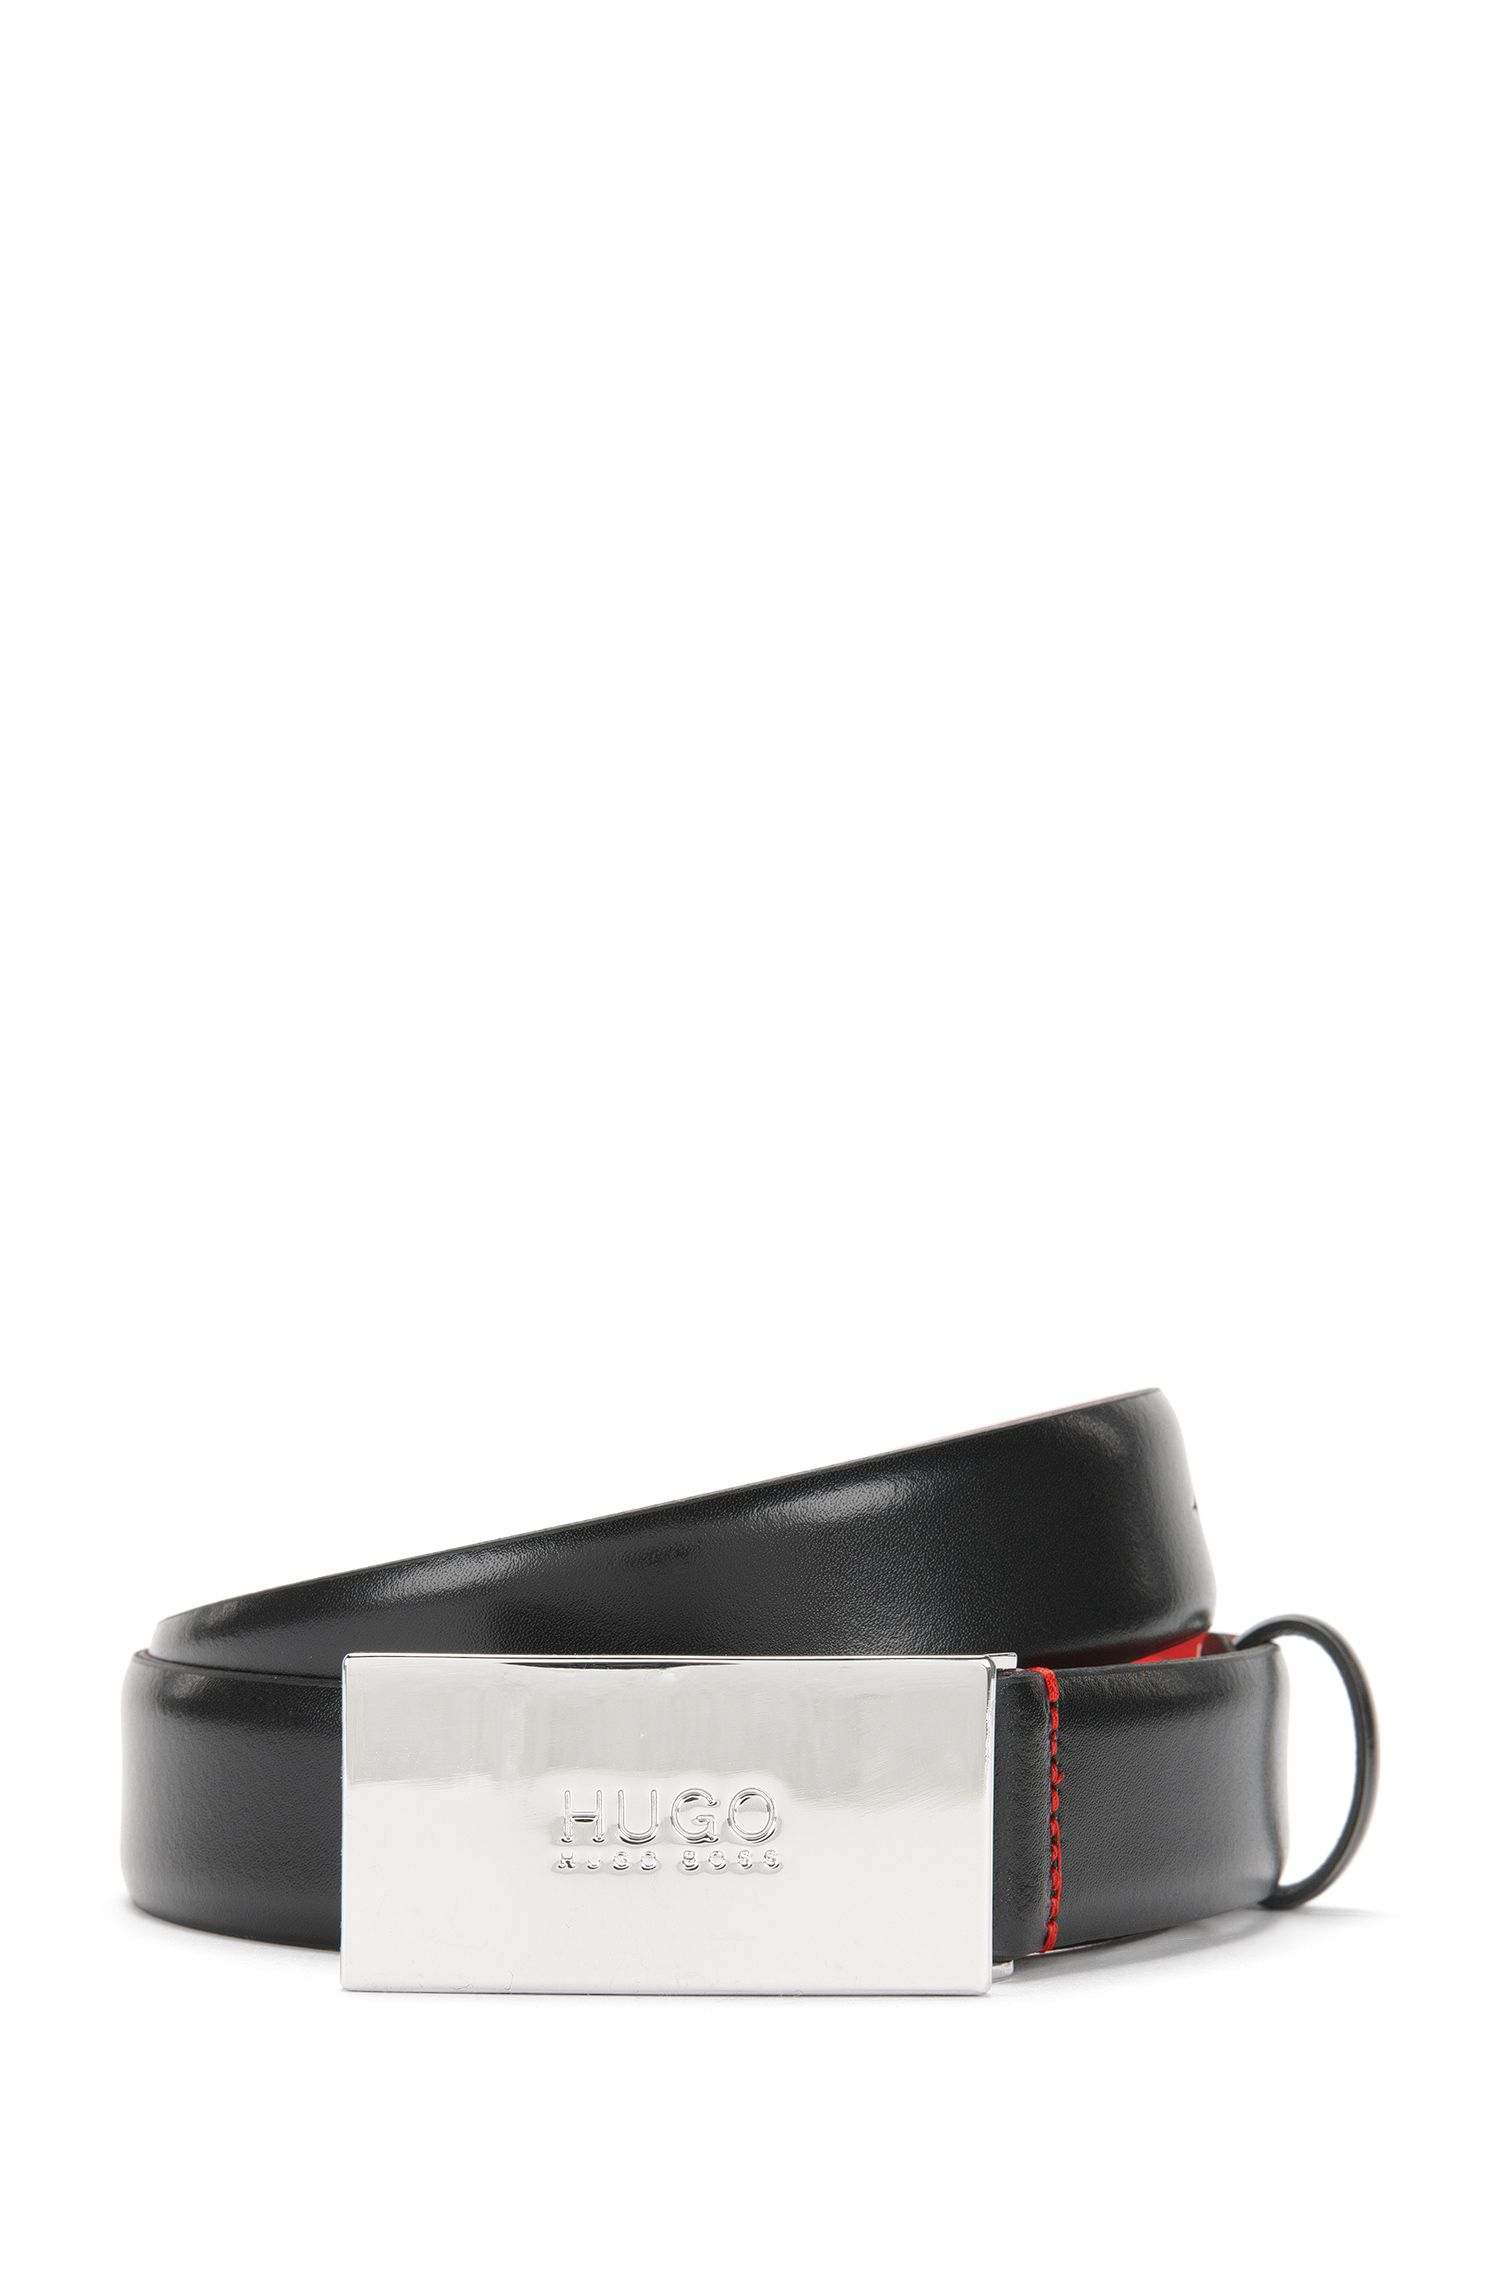 Pin Buckle Leather Belt | Baldwin N